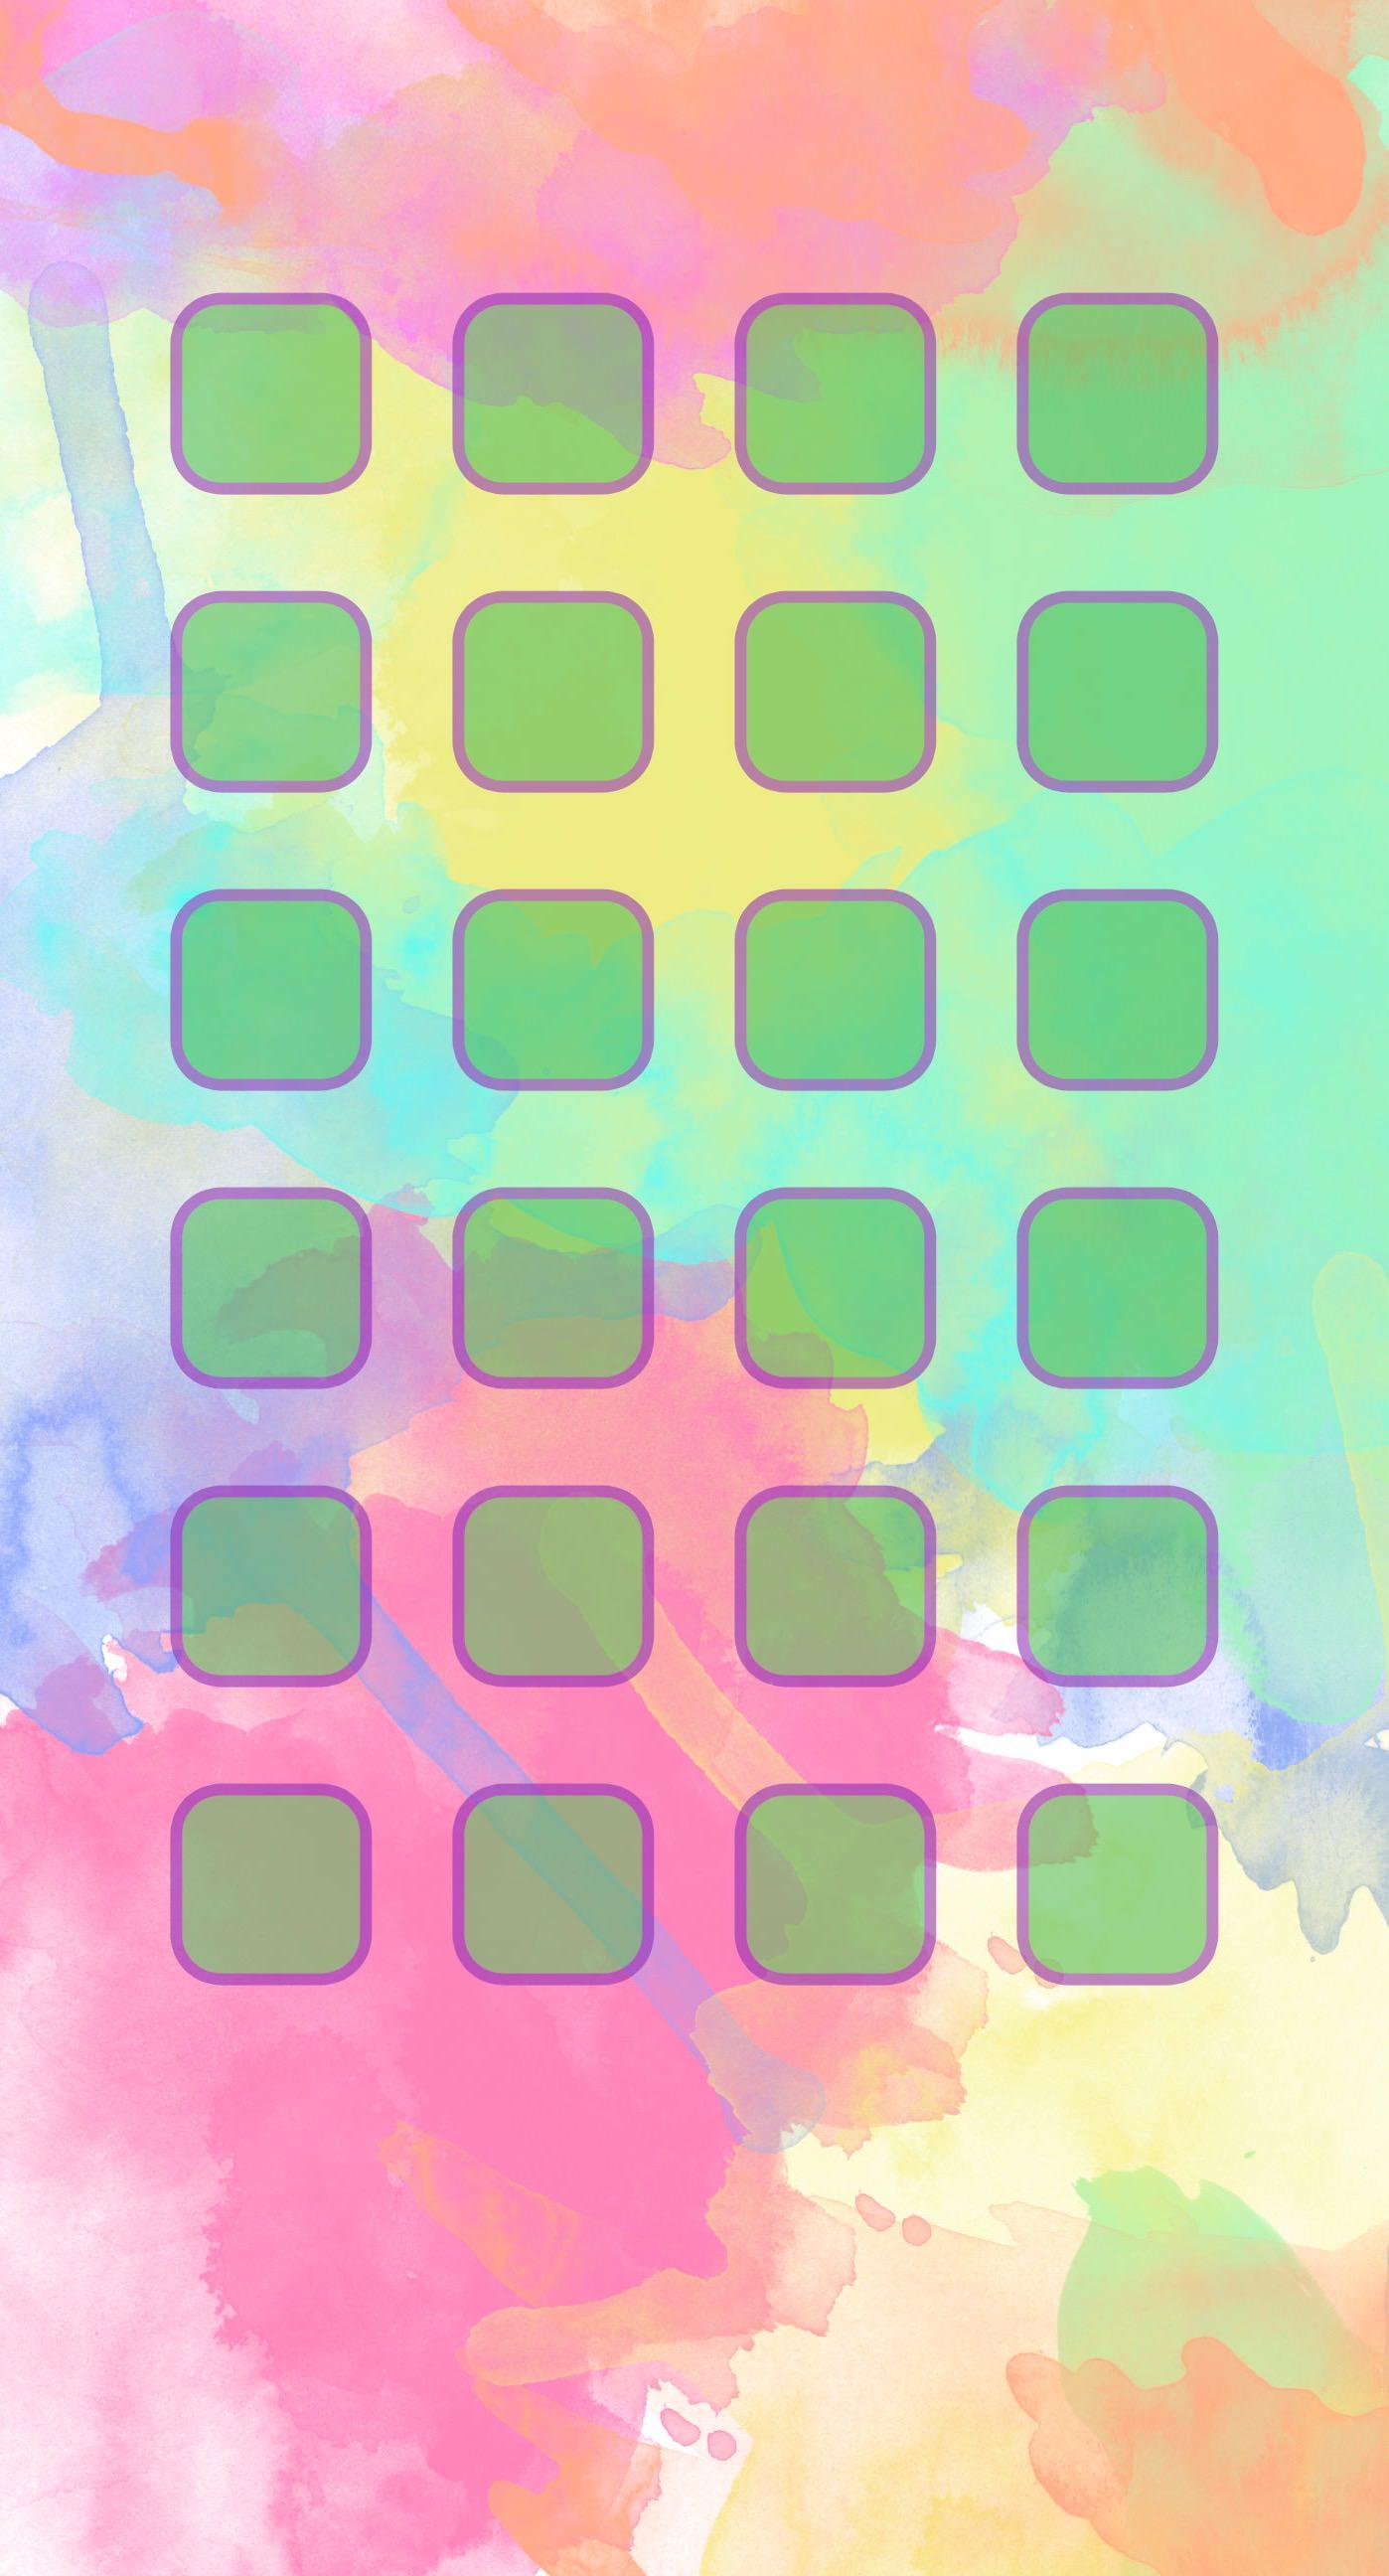 IPhone 6s Plus 6 Wallpaper